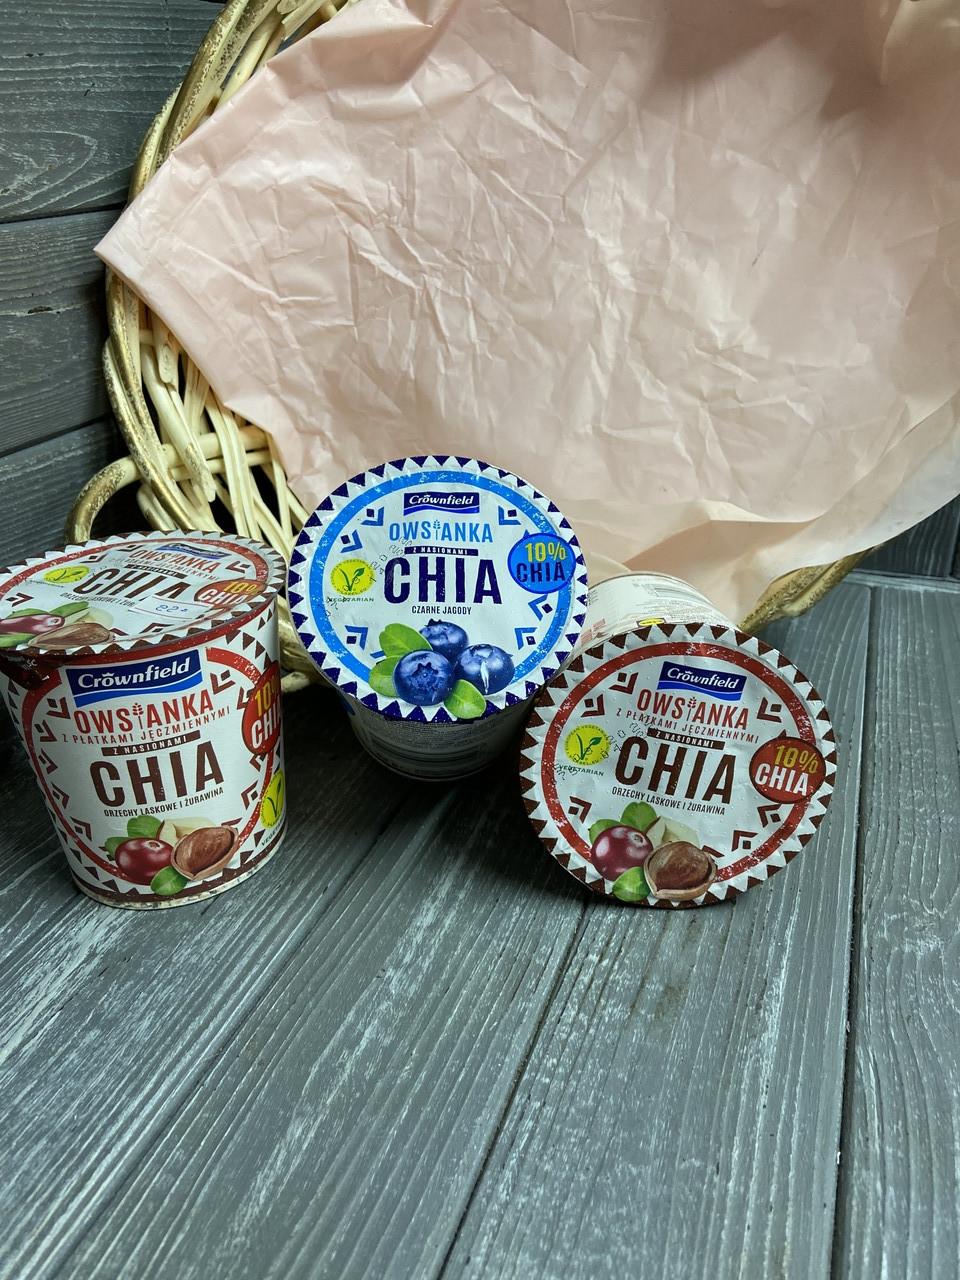 Вівсянка з чіа в асортименті Crownfield owsianka z nasionami chia